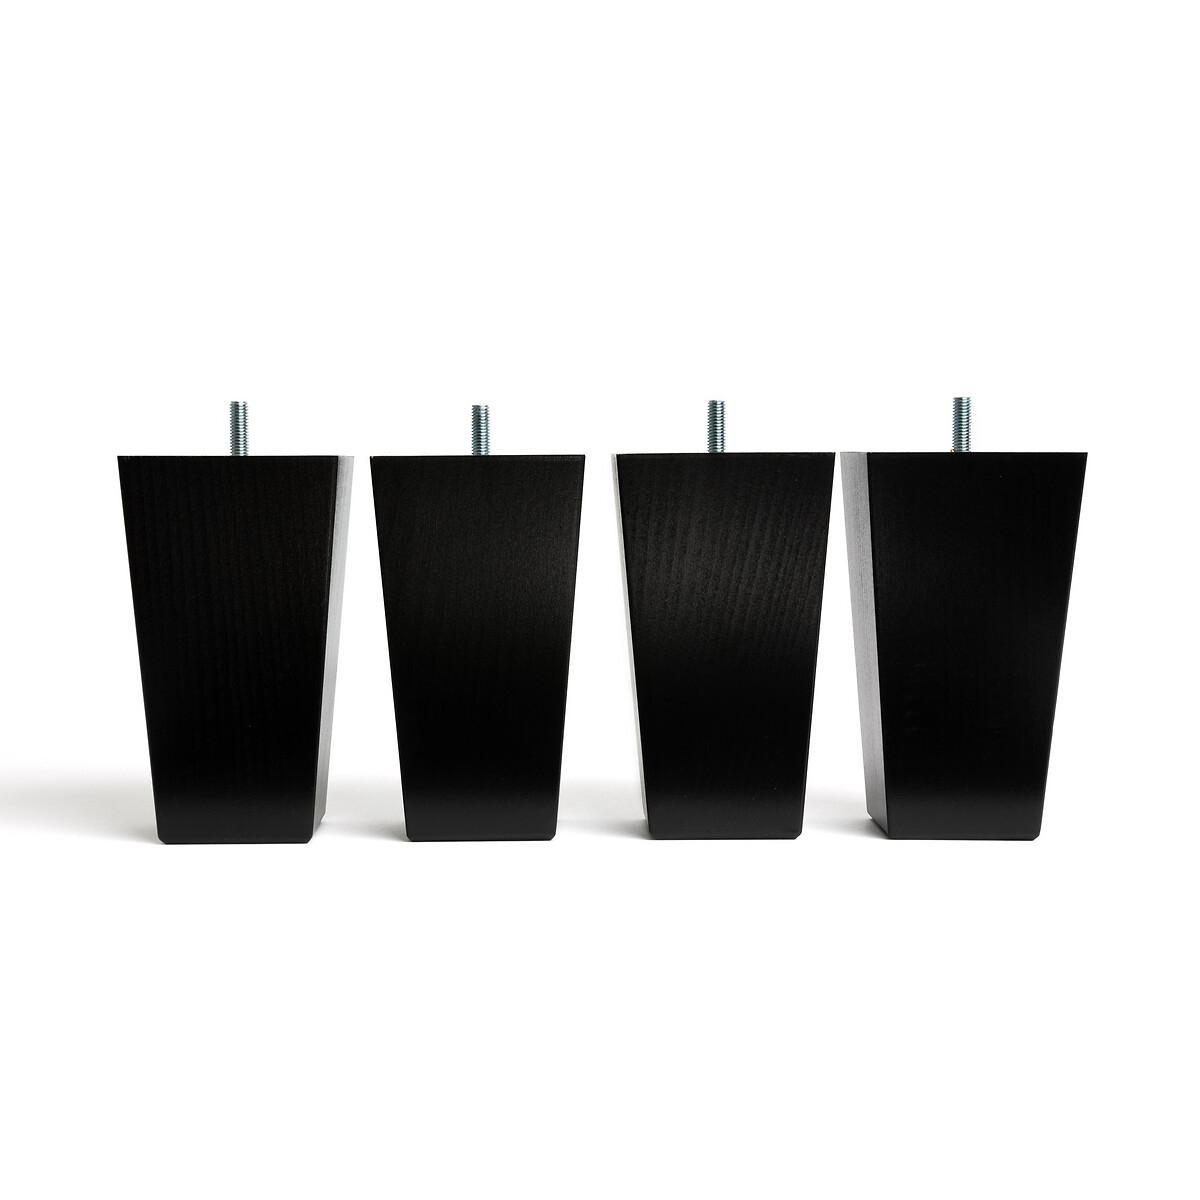 Ножки La Redoute Для кровати Trapecio 15 см черный, размер 15 см купить во Vseblaga.ru